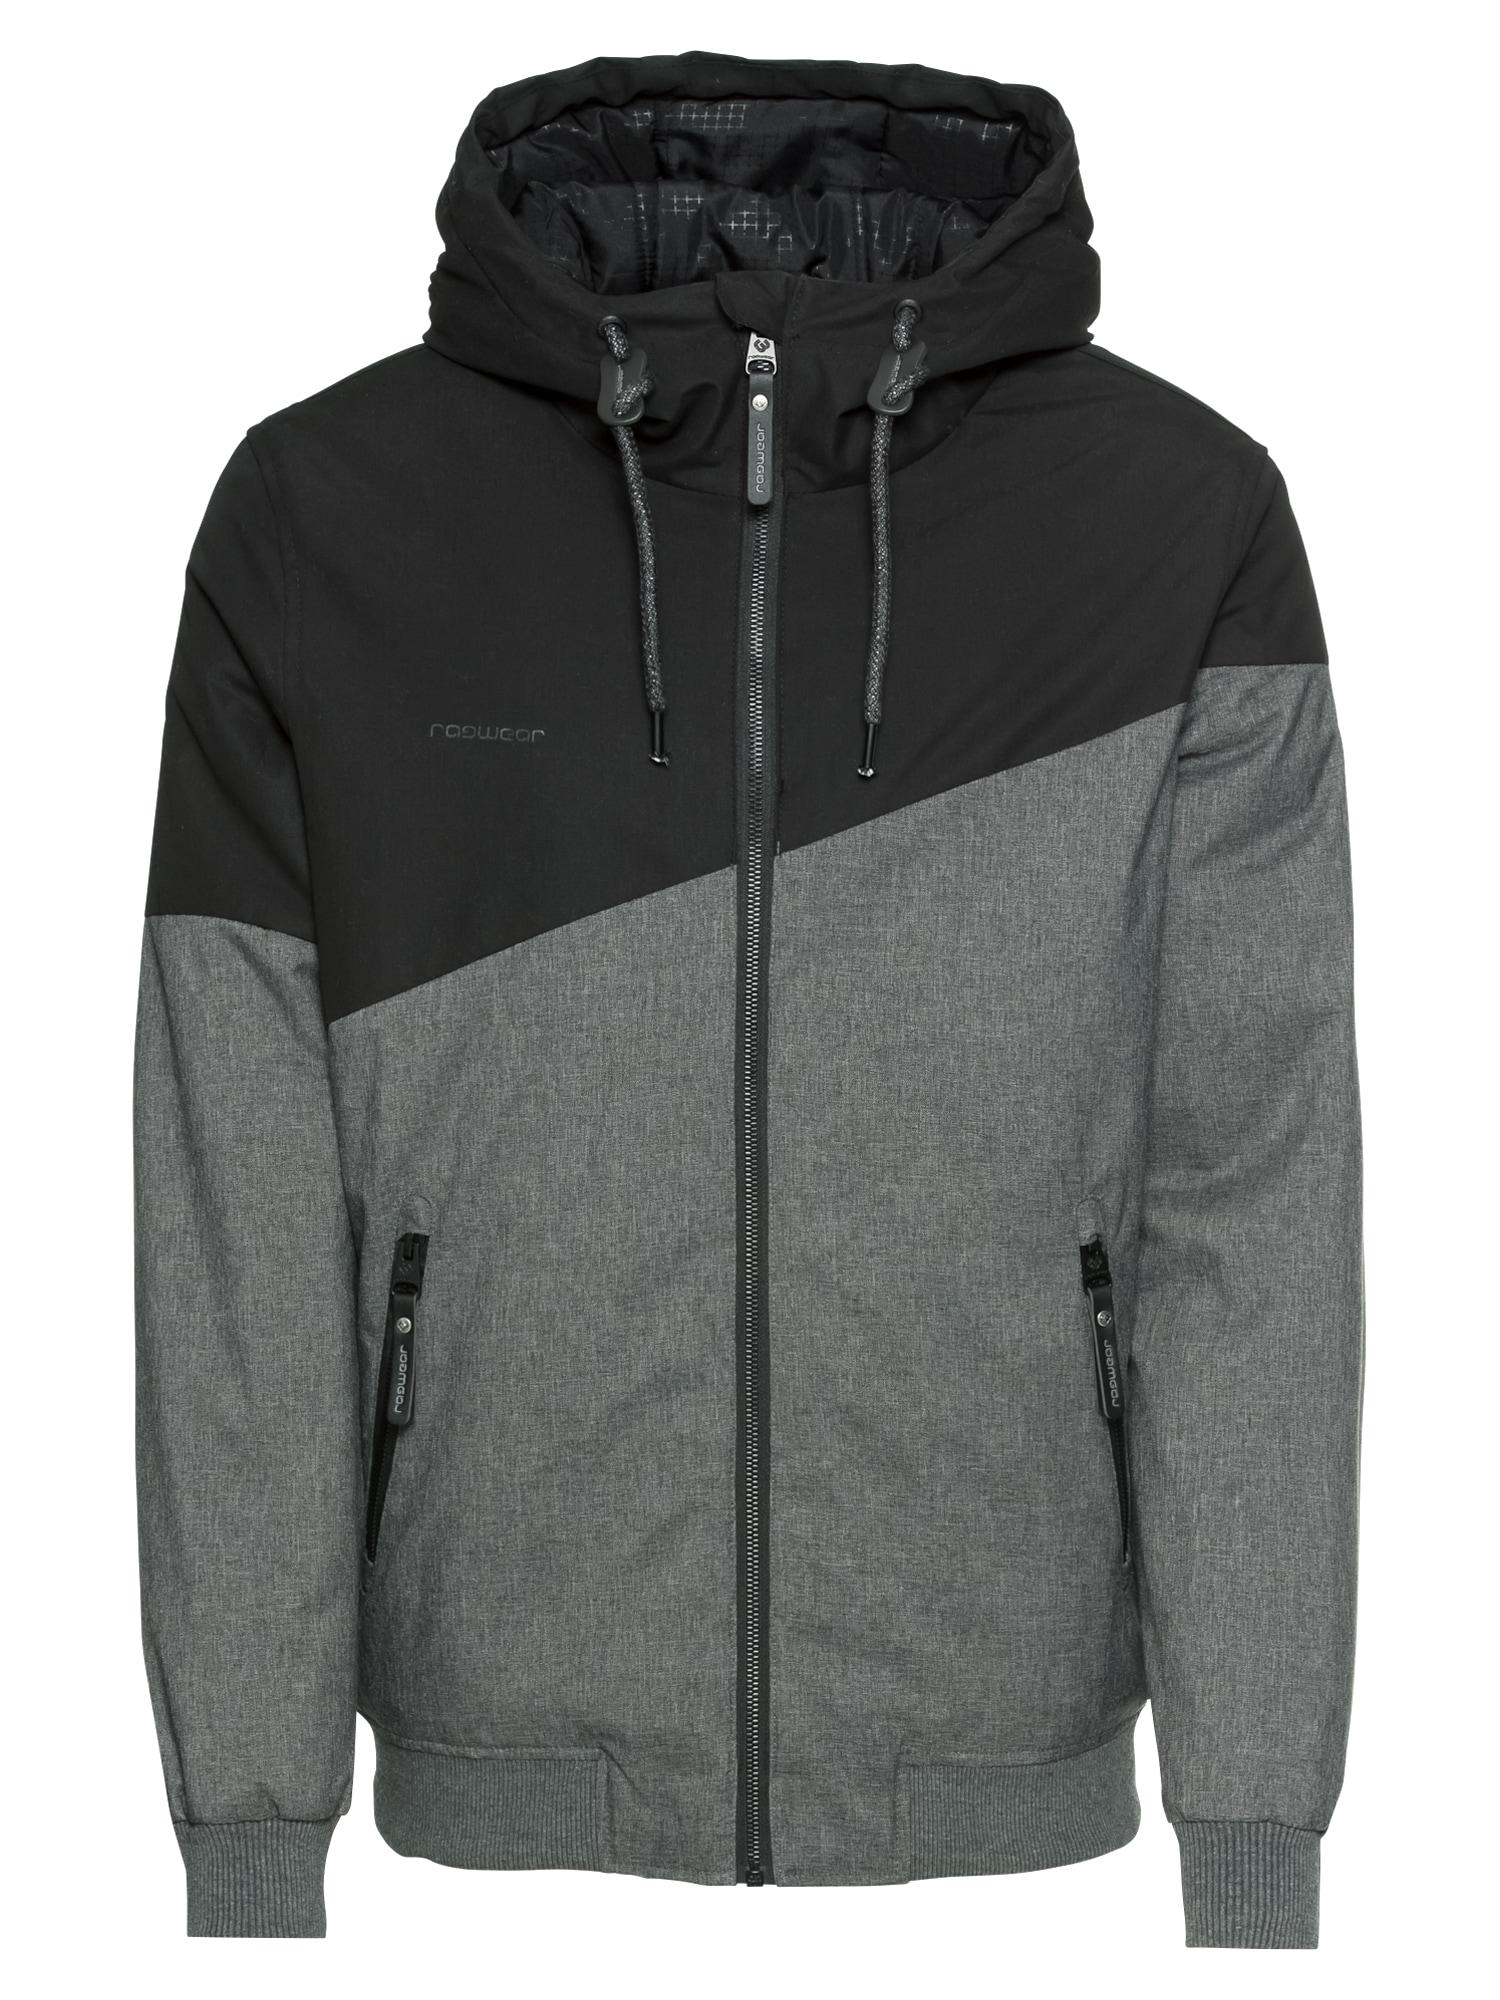 Přechodná bunda WINGS tmavě šedá černá Ragwear